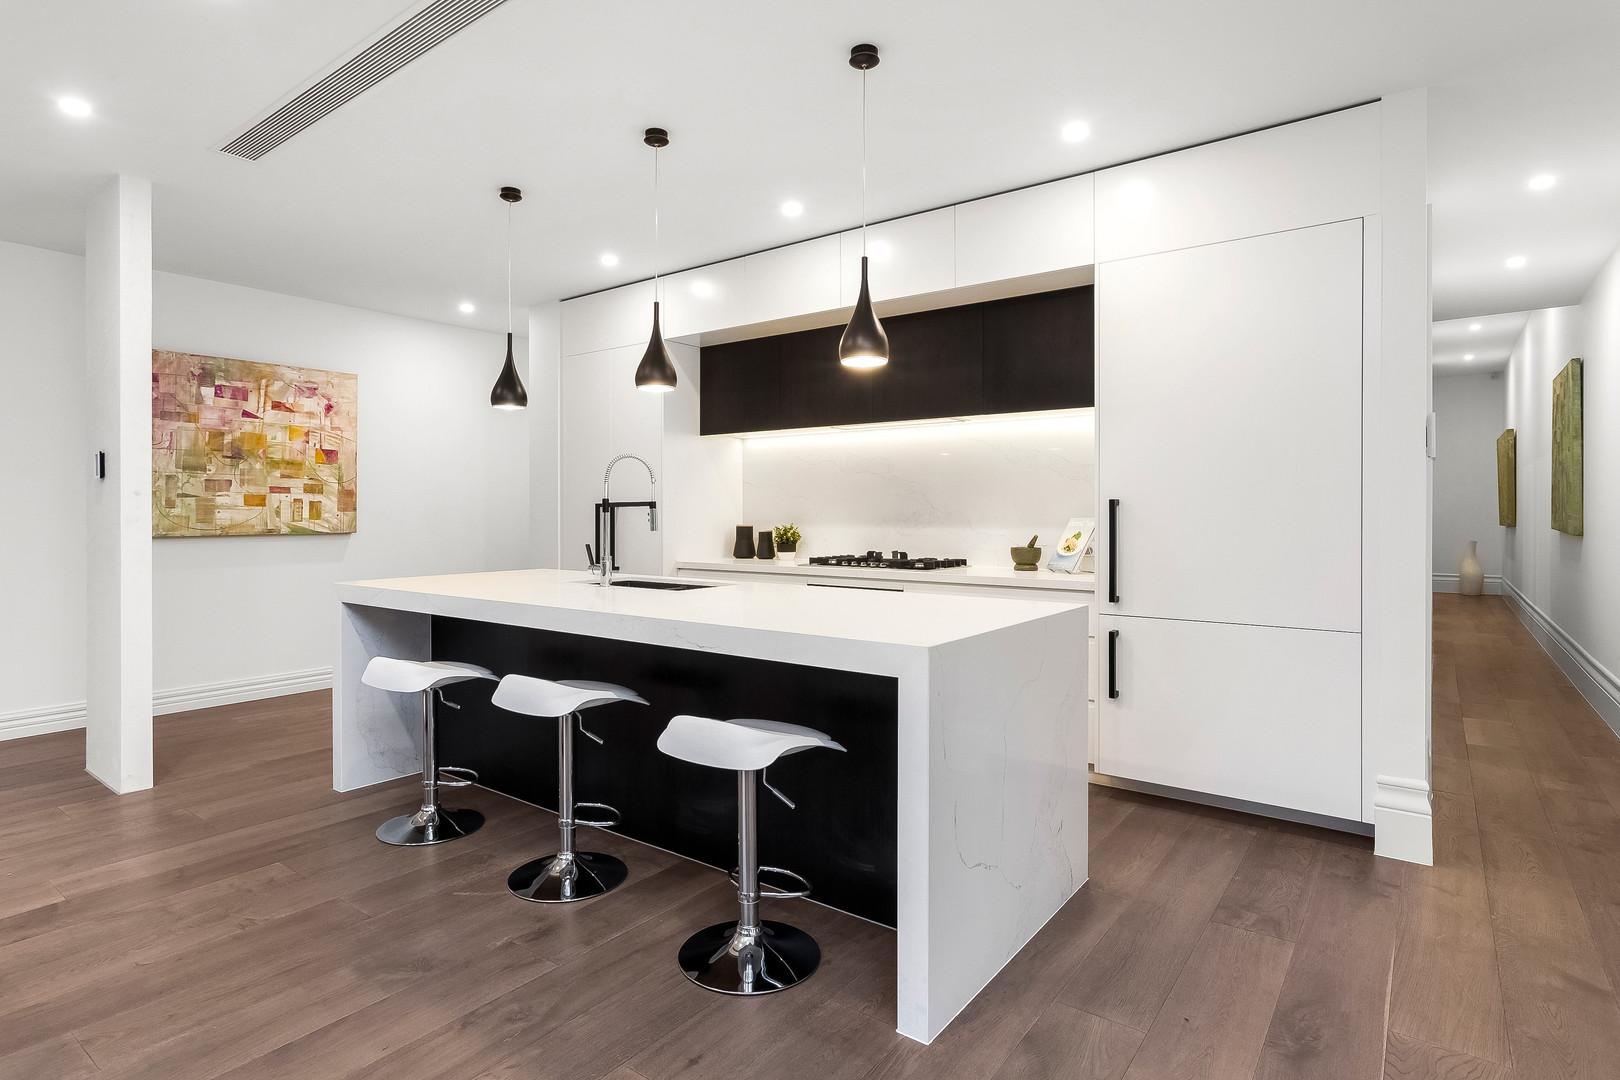 Rendered image of luxury kitchen